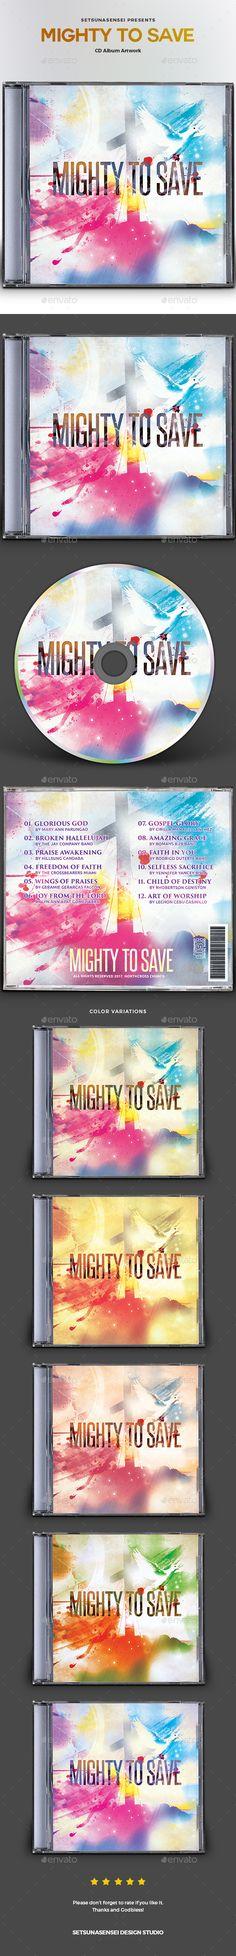 Mighty to Save CD Album Artwork - #CD & DVD Artwork Print Templates